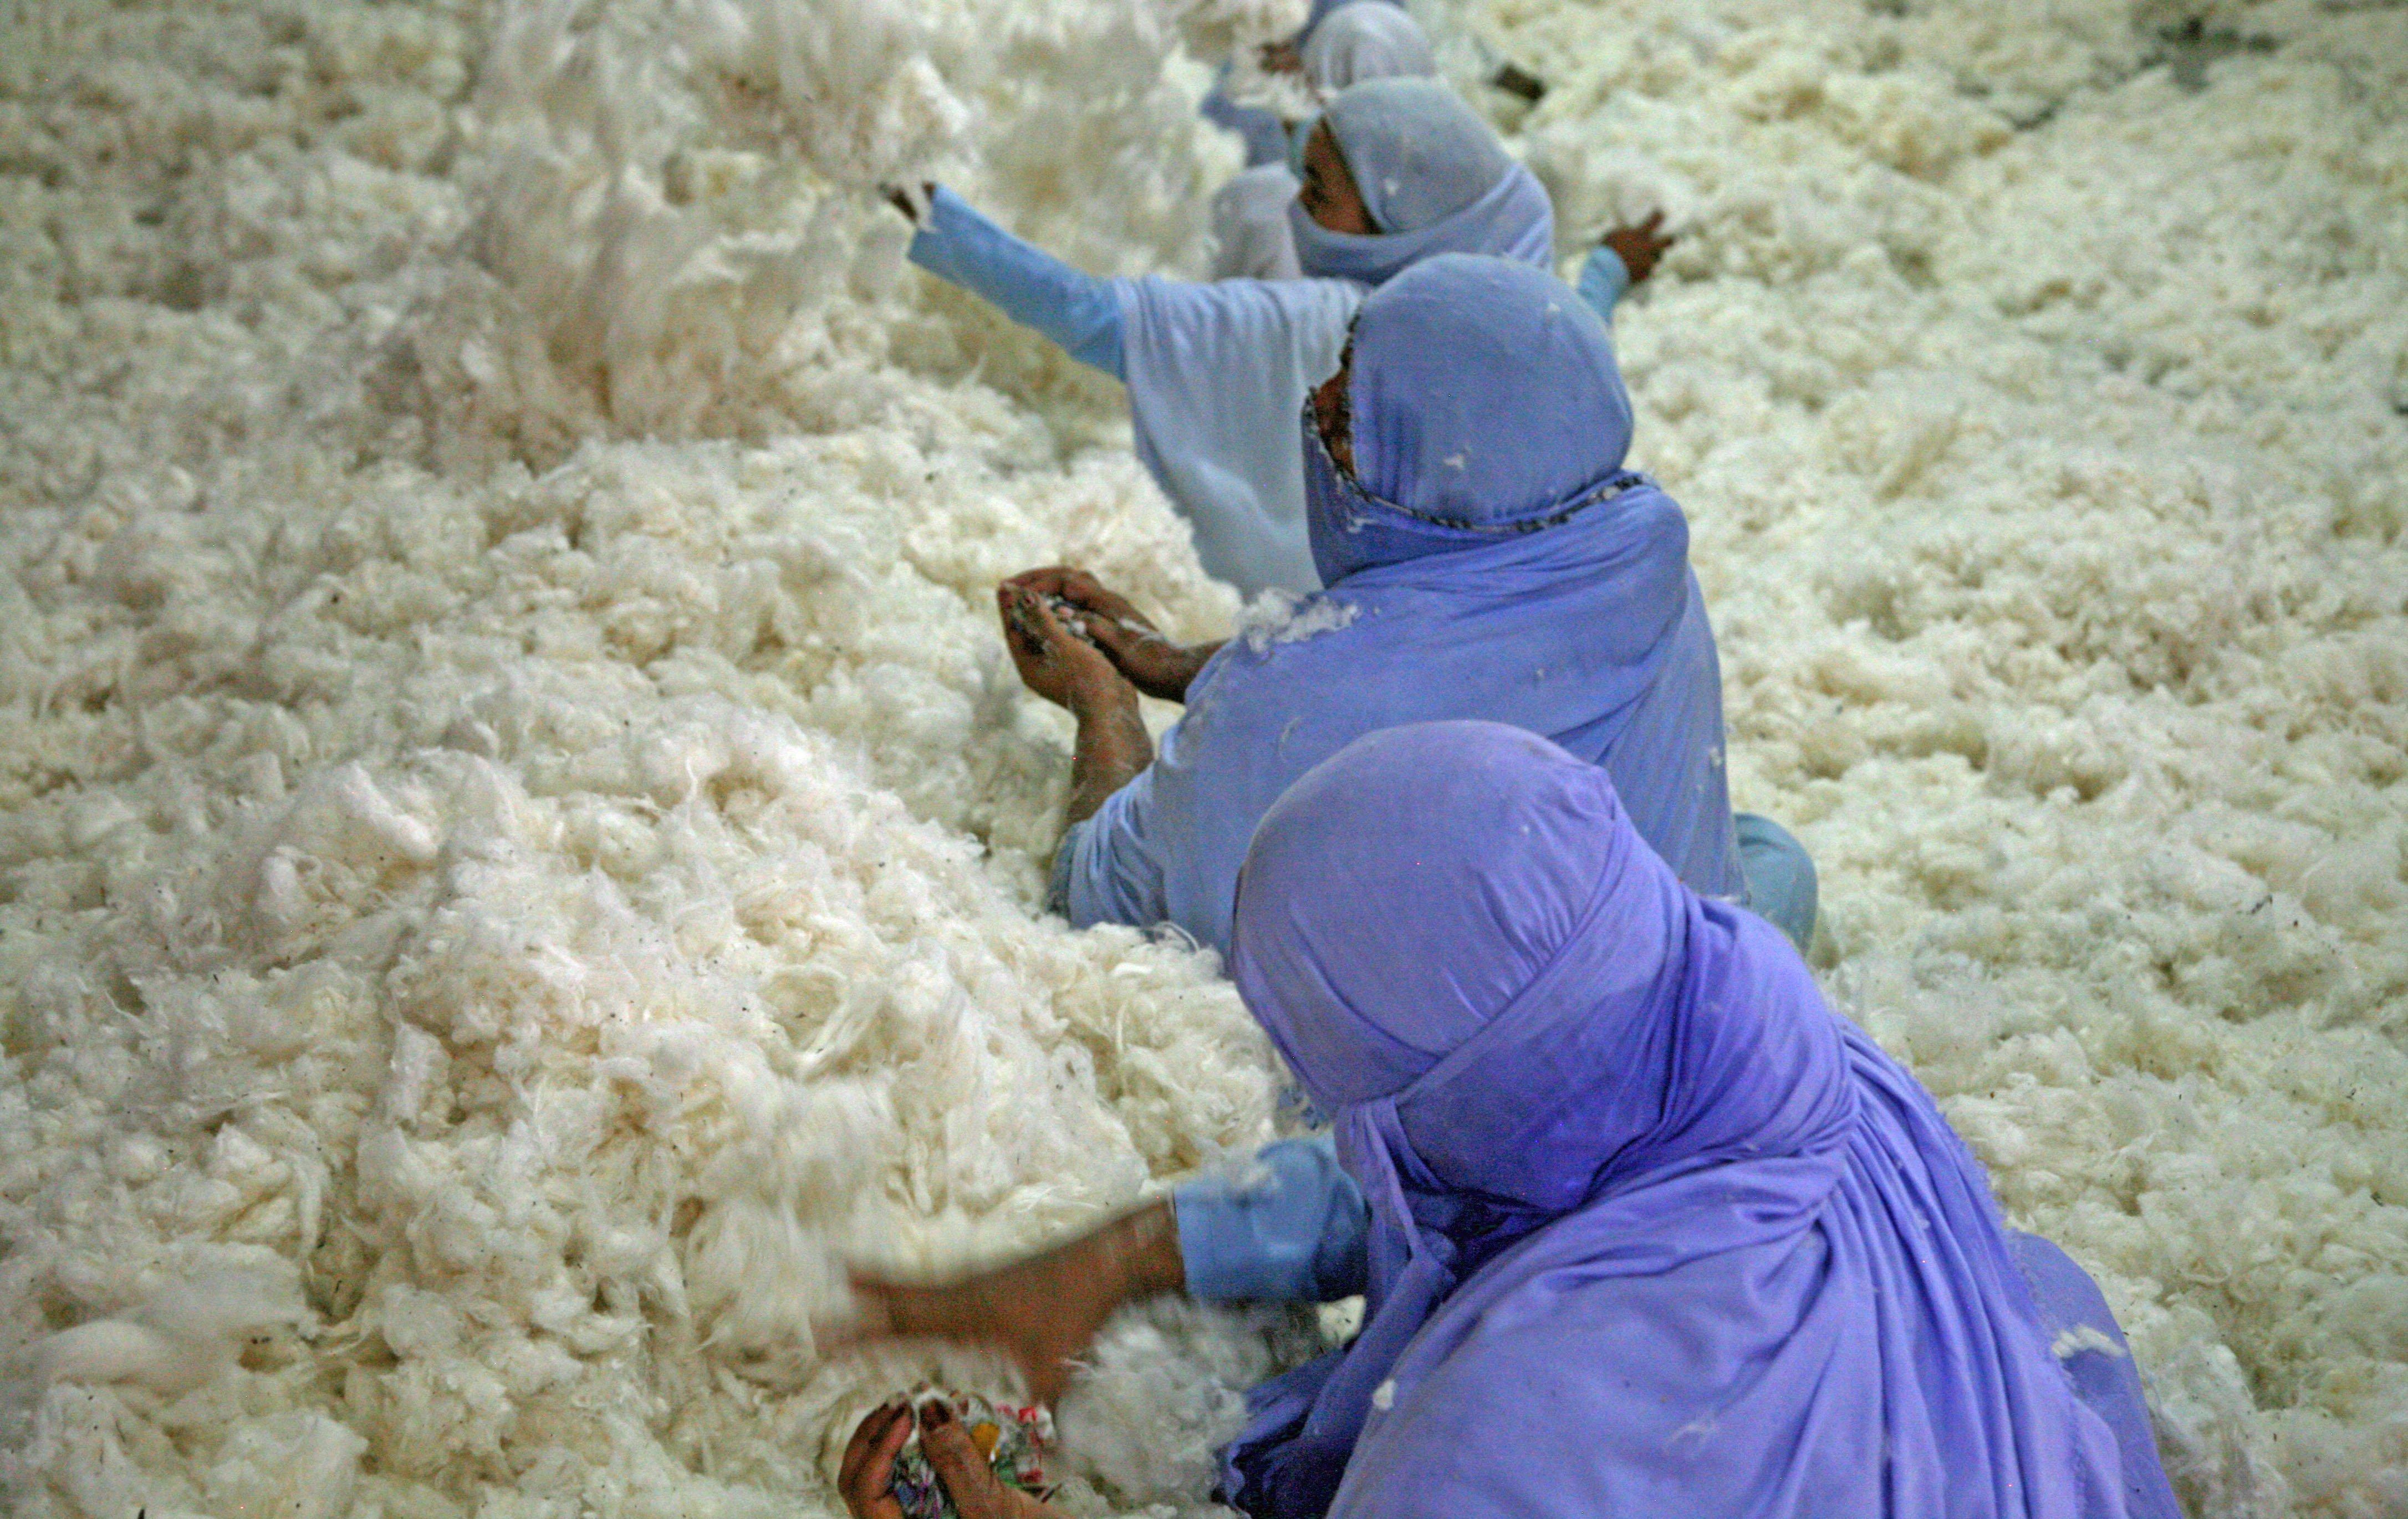 Women decontaminating cotton at J. K. Spinning Mills, near Faisalabad, Punjab, Pakistan. Photo: PRISE/Rajeshree Sisodia